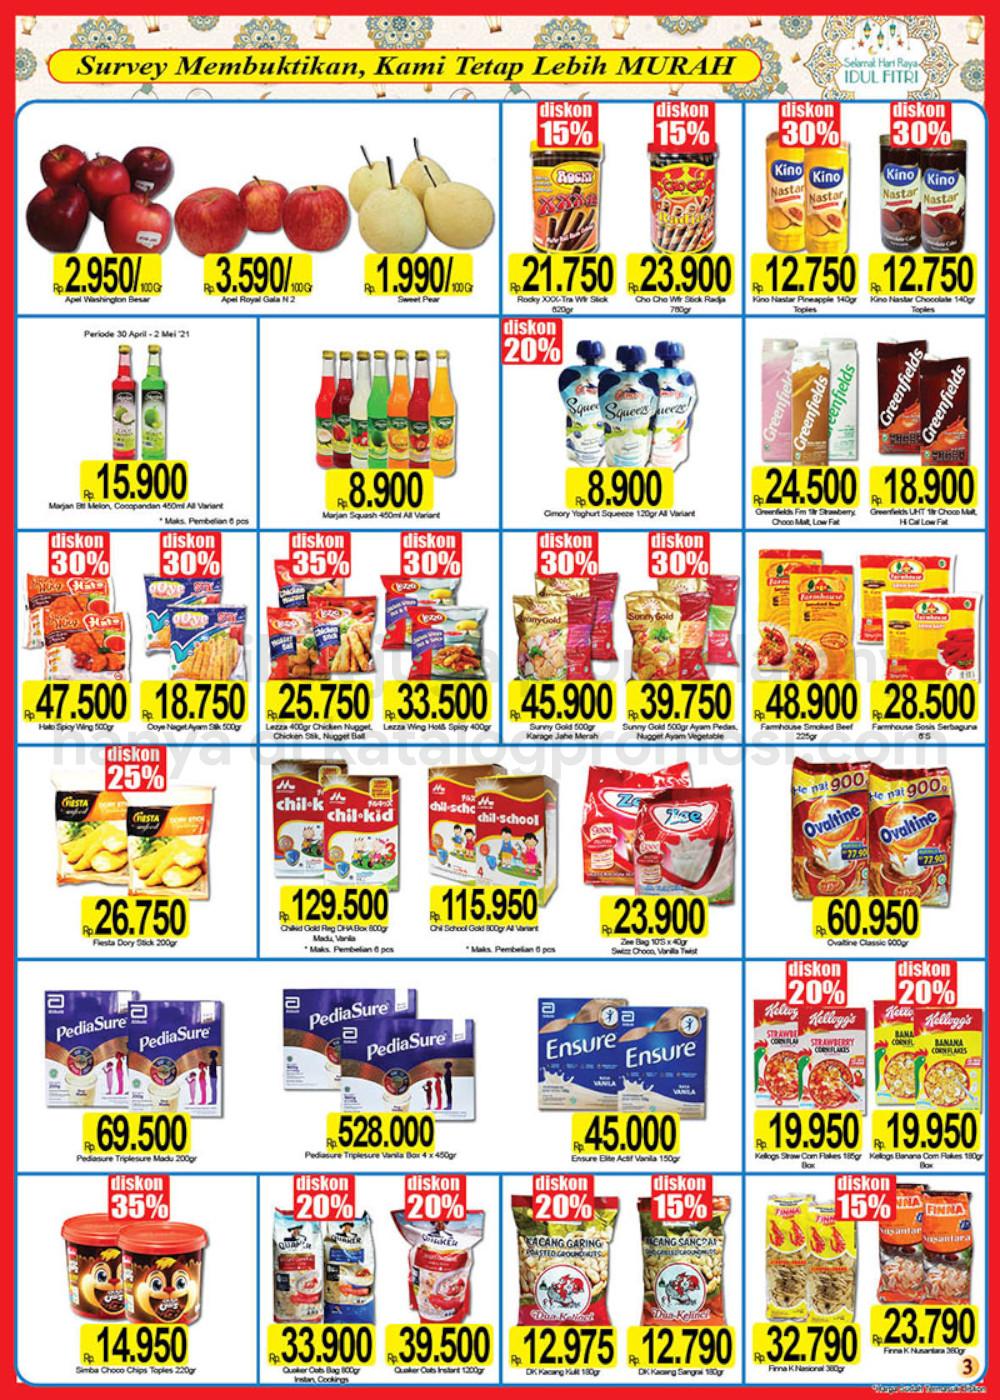 Katalog Promo NAGA SWALAYAN Terbaru Periode 25 April - 16 Mei 2021